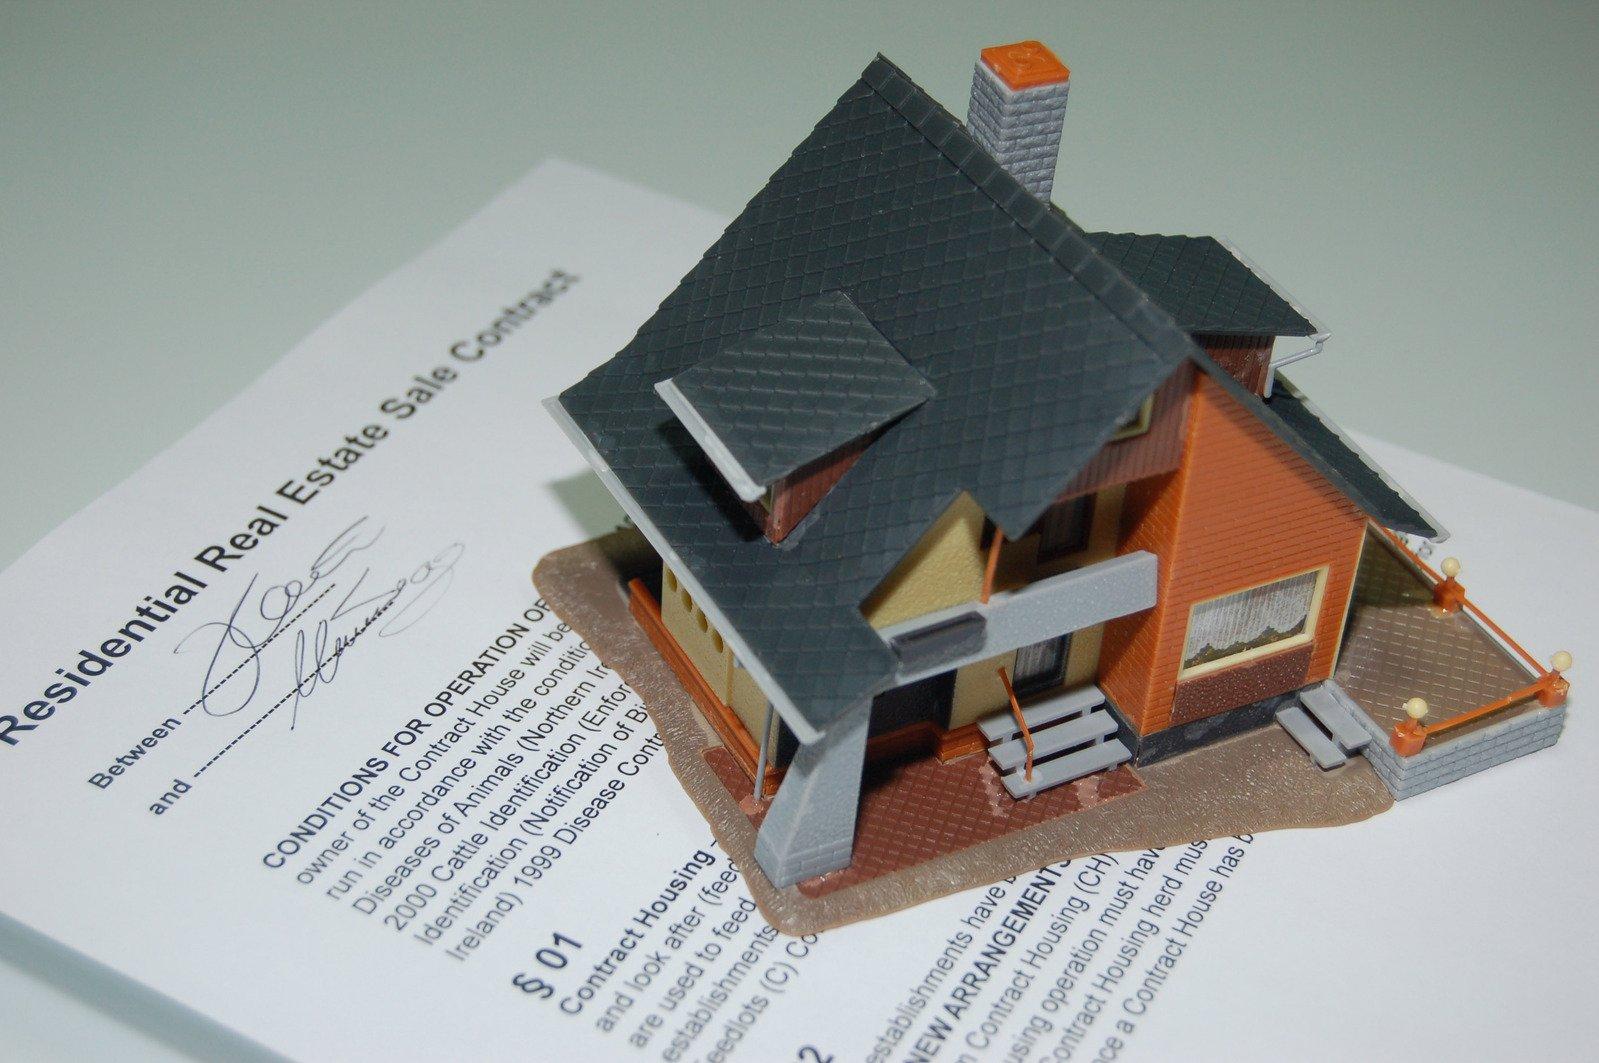 Сопровождение сделок купли-продажи недвижимости